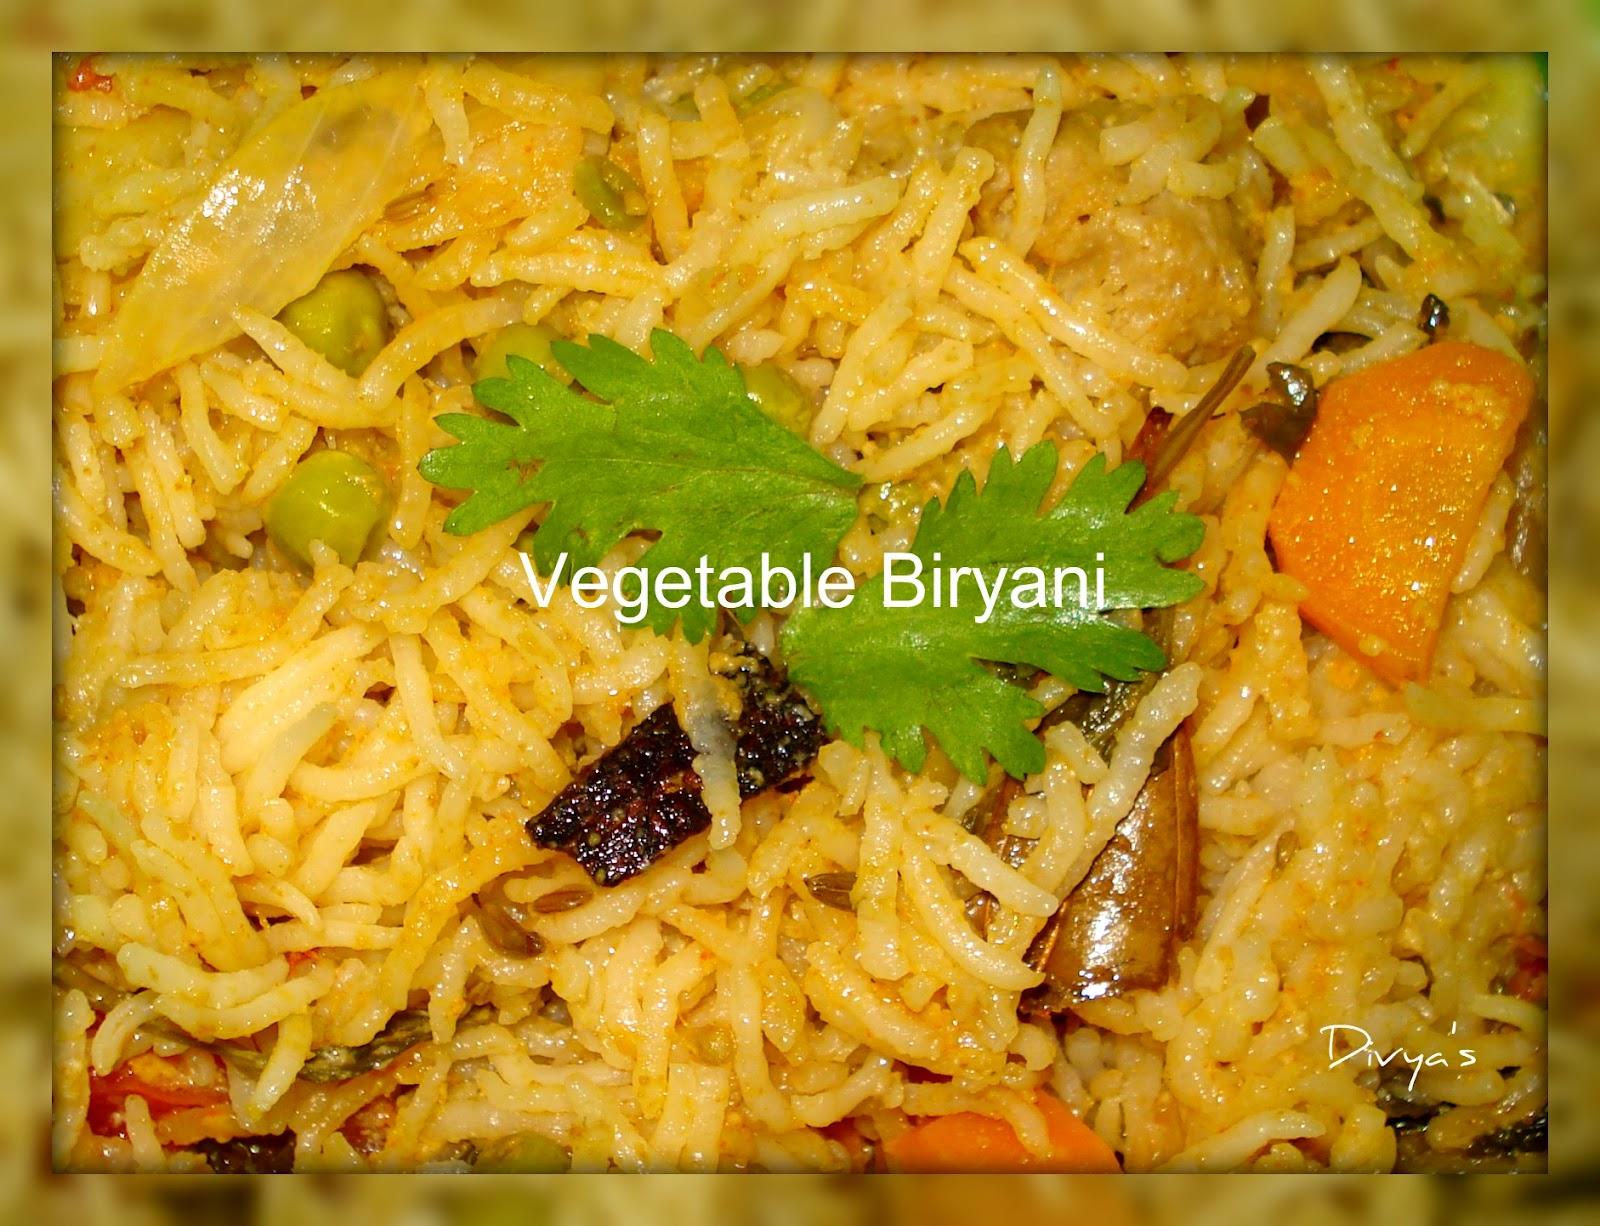 Vegetable Biryani | You Too Can Cook